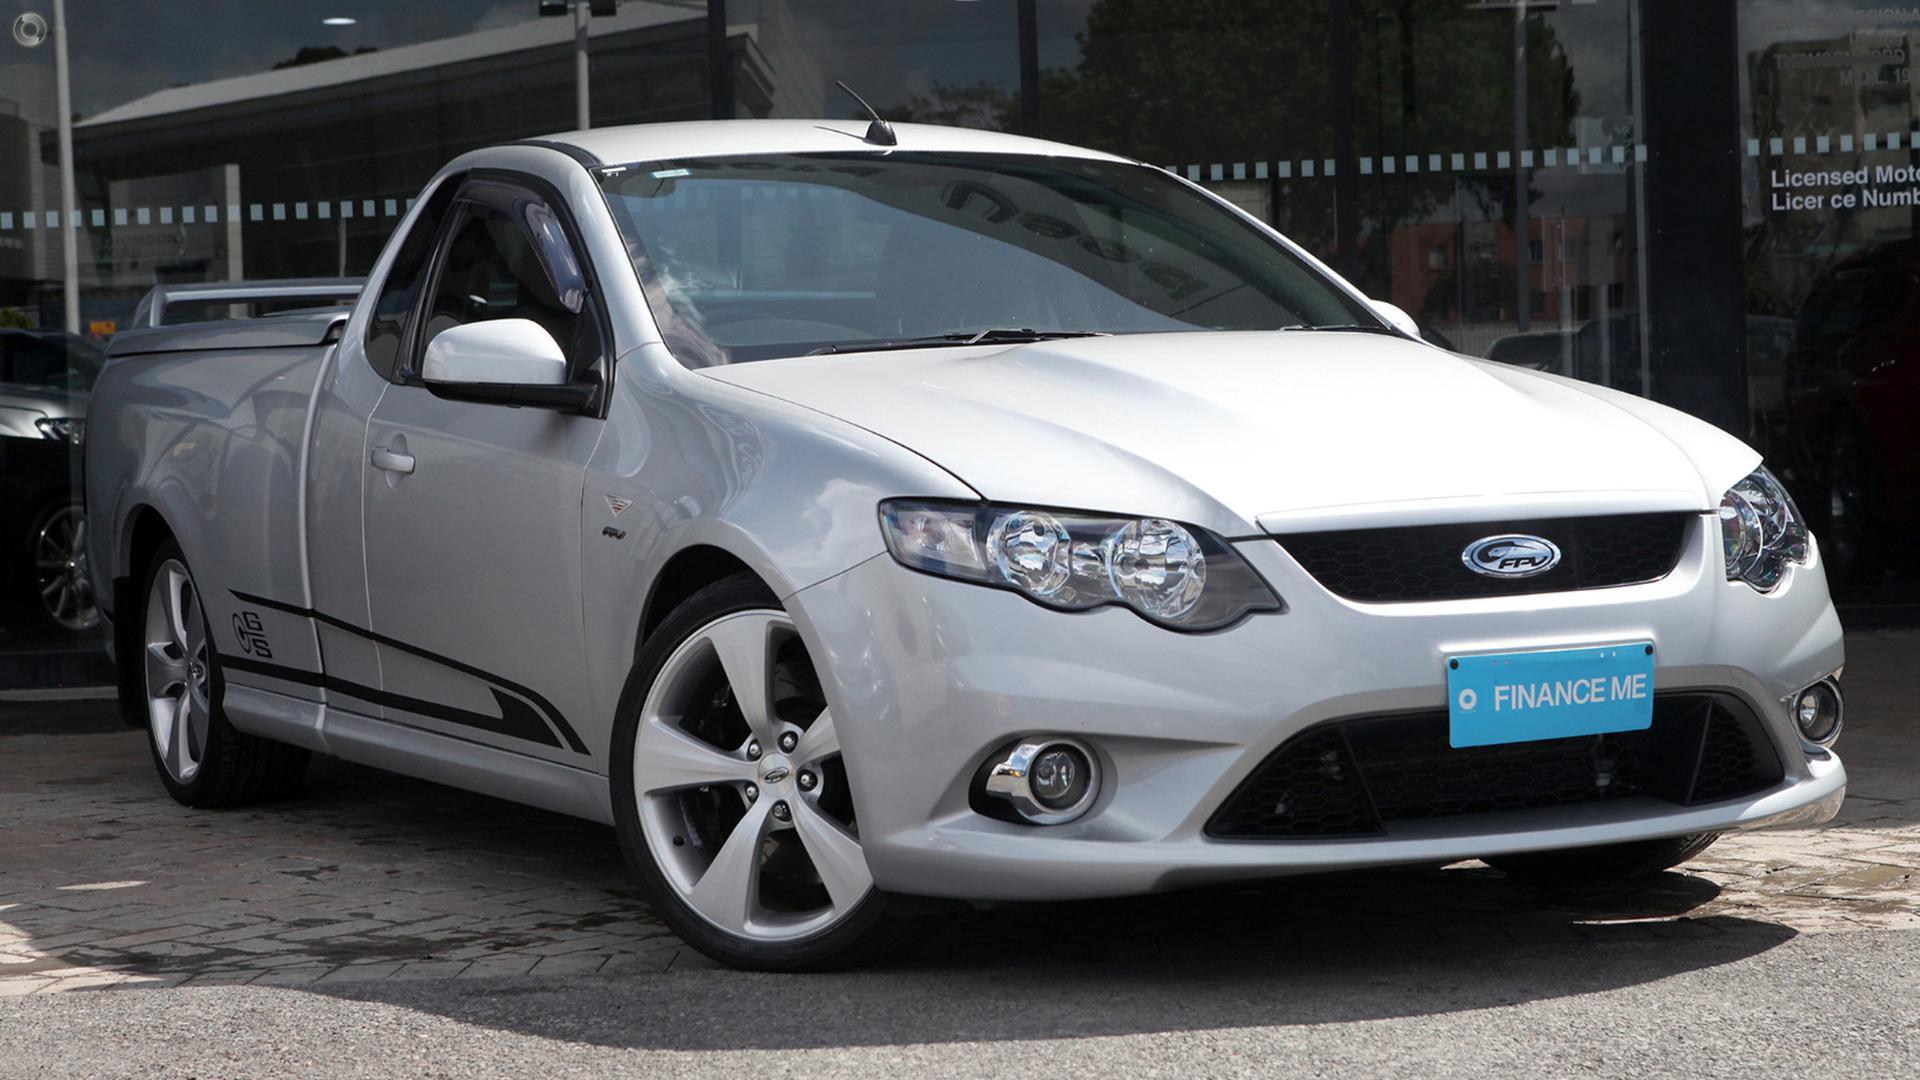 2011 Ford Performance Vehicles GS FG MK II